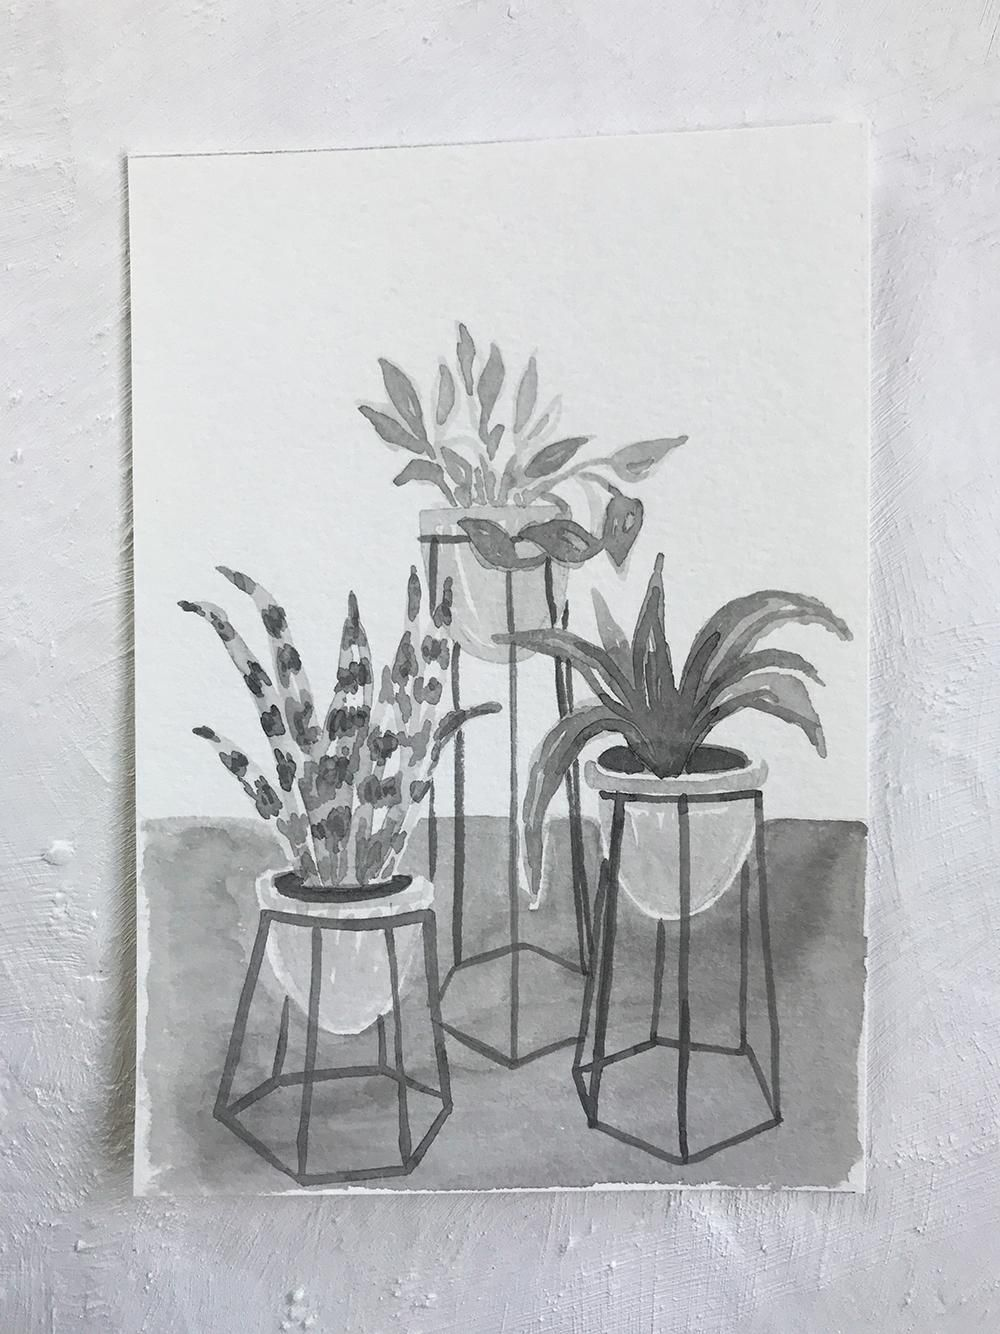 Birmingham Plant Stores - image 3 - student project